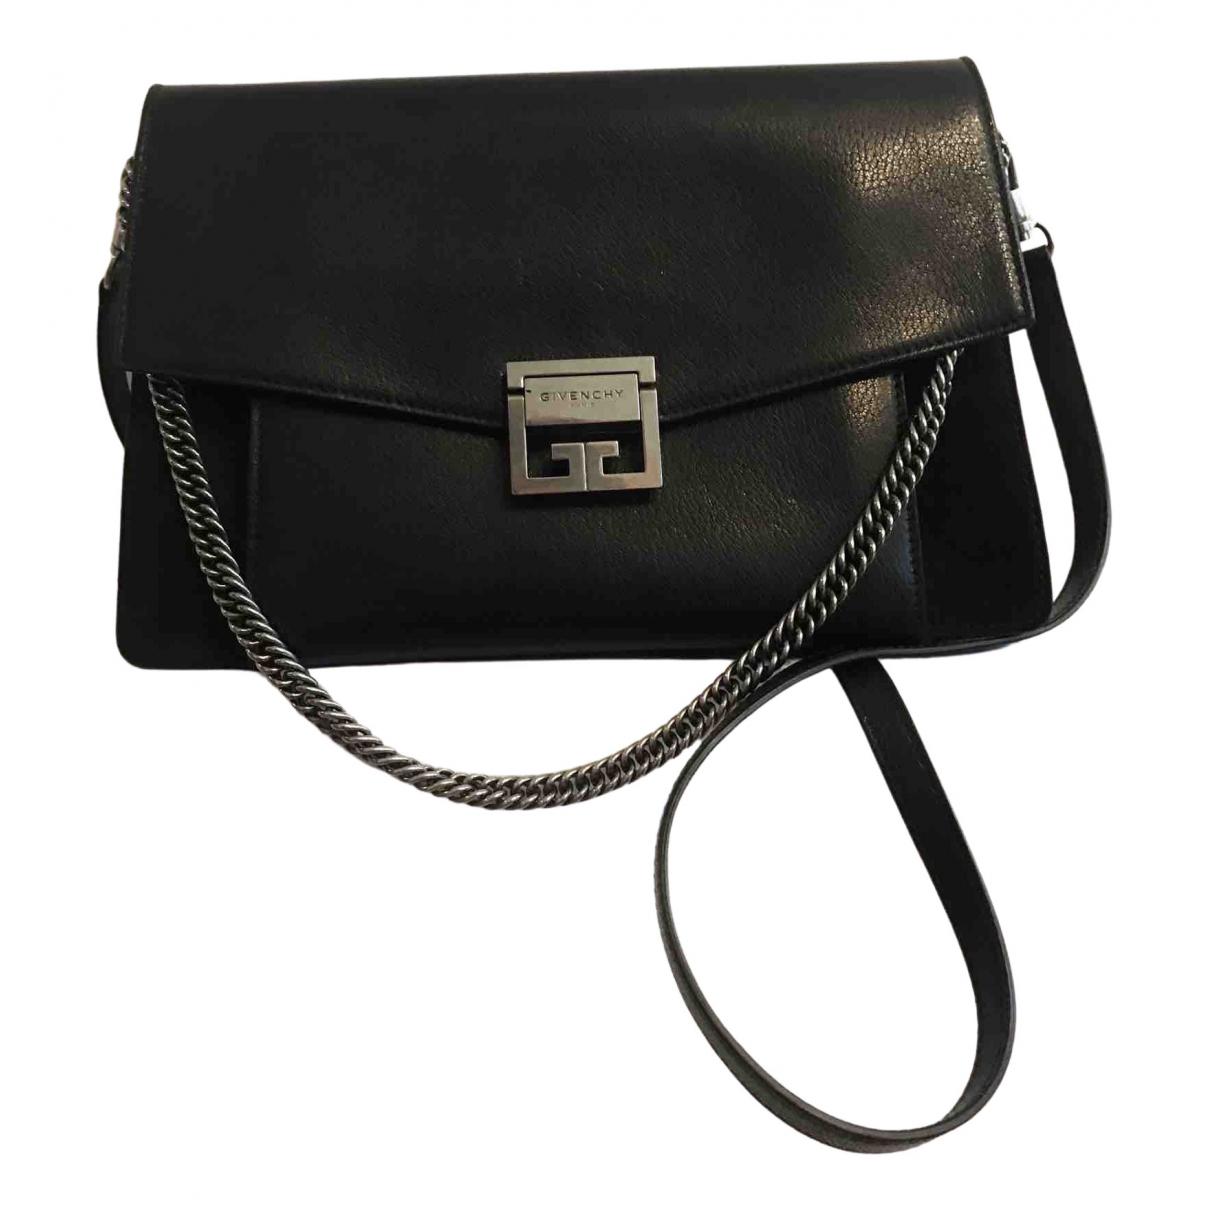 Givenchy - Sac a main GV3 pour femme en cuir - noir